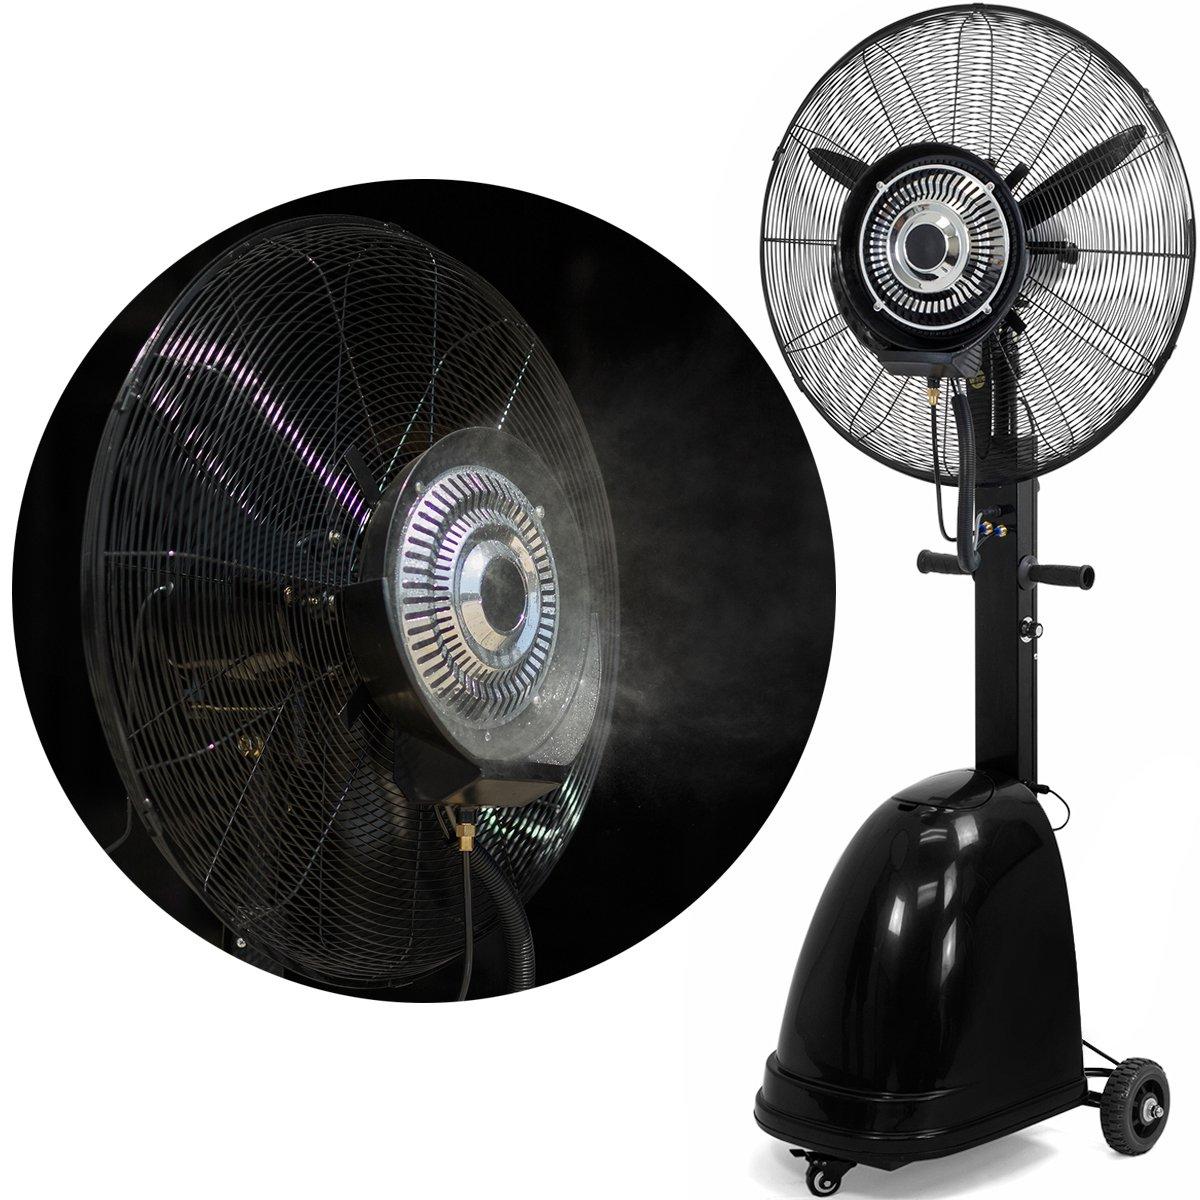 Stark High Power Misting Fan Metal 26'' Oscillating Mist Fan Cooling Warehouse Indoor/Outdoor Adjustable Speed Water Tank w/Wheel by Stark USA